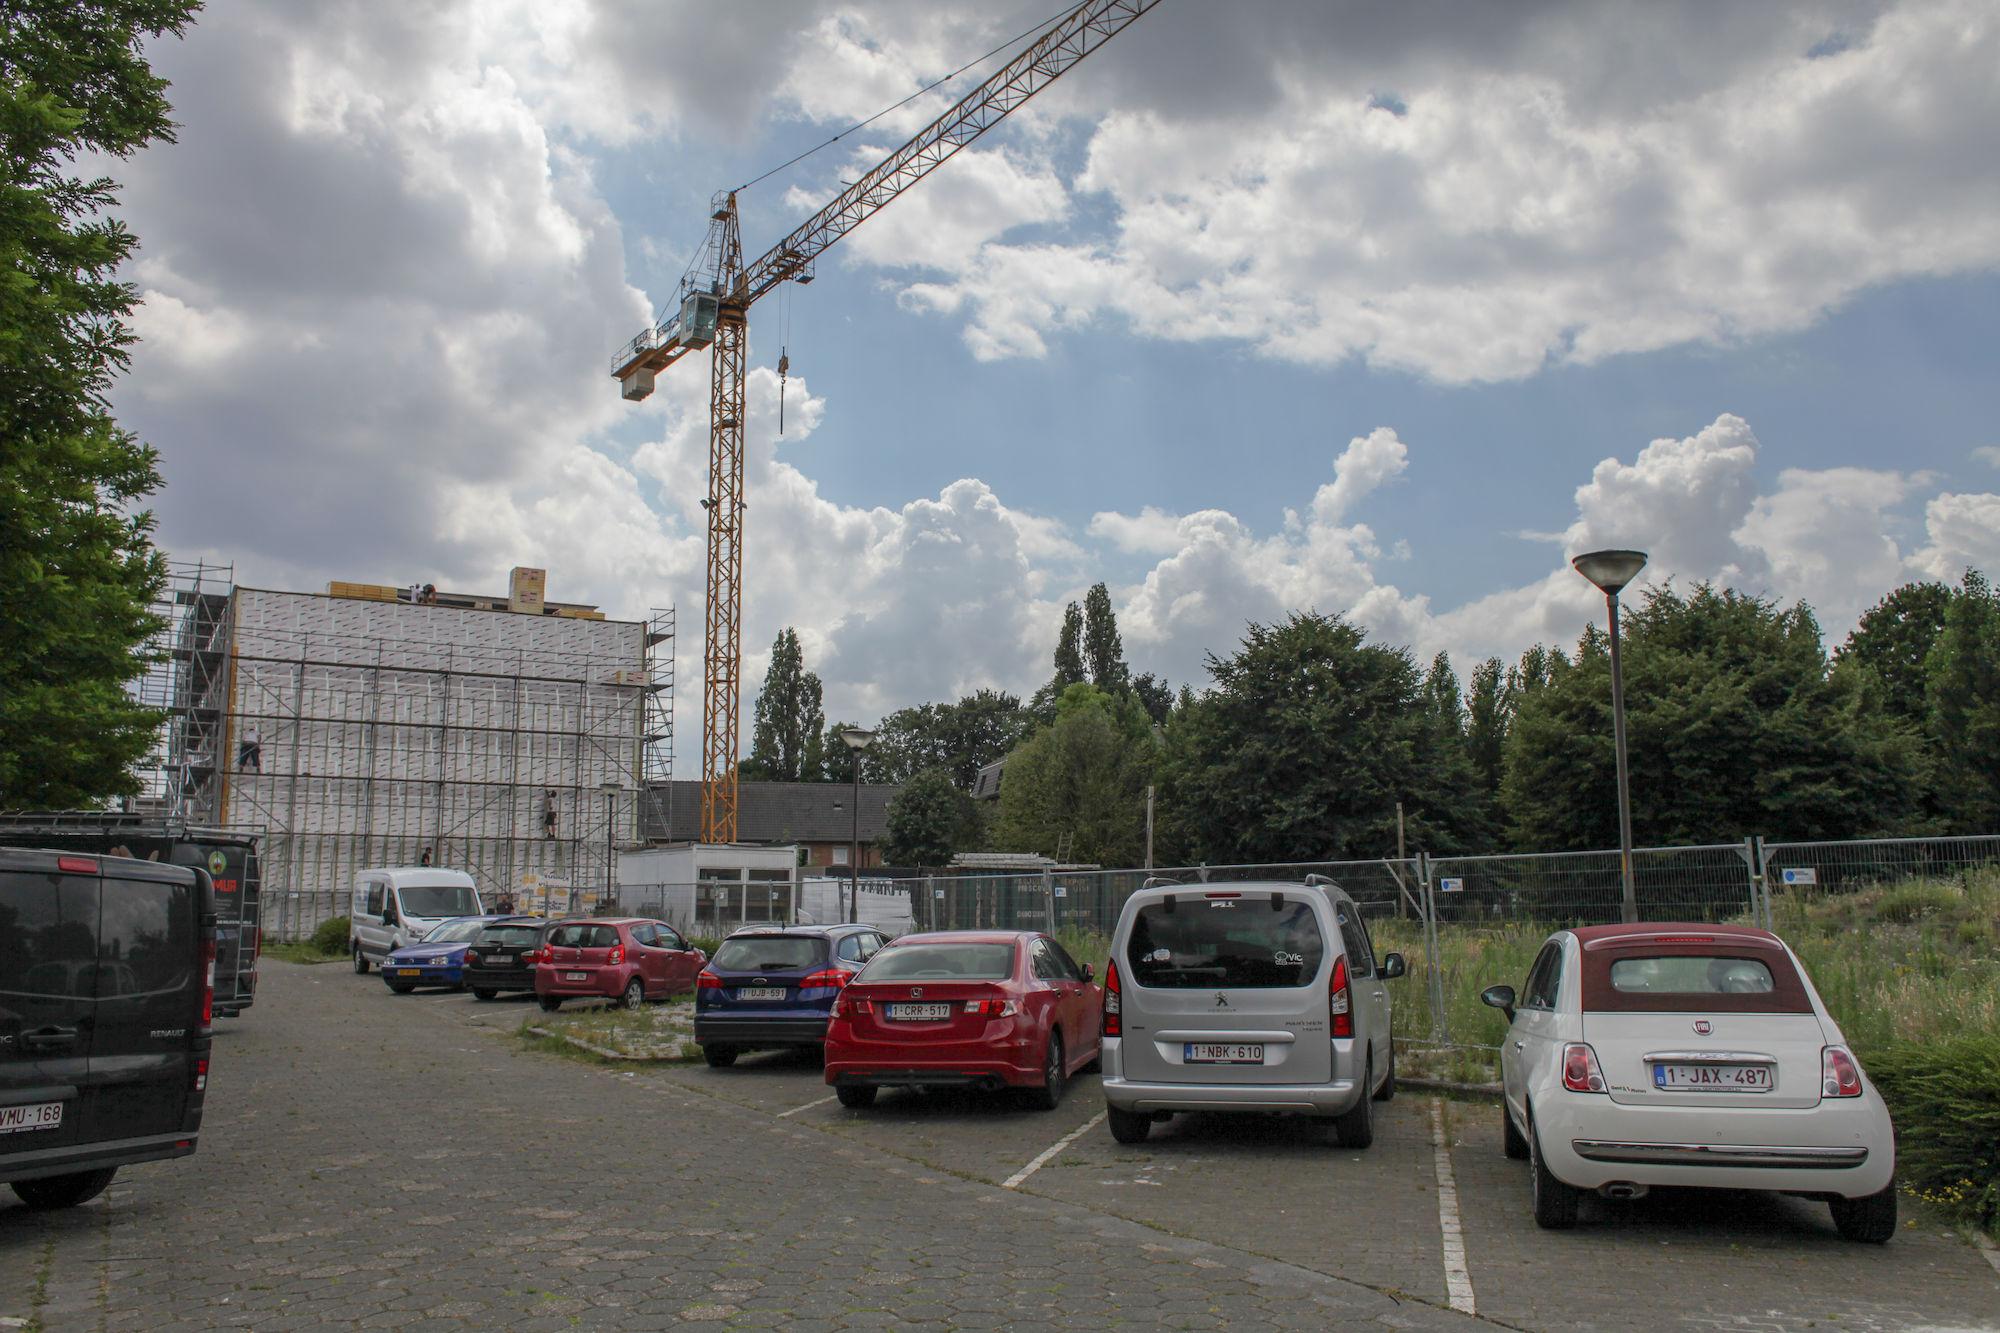 2019-07-02 Muide Meulestede prospectie Wannes_stadsvernieuwing_IMG_0324-2.jpg